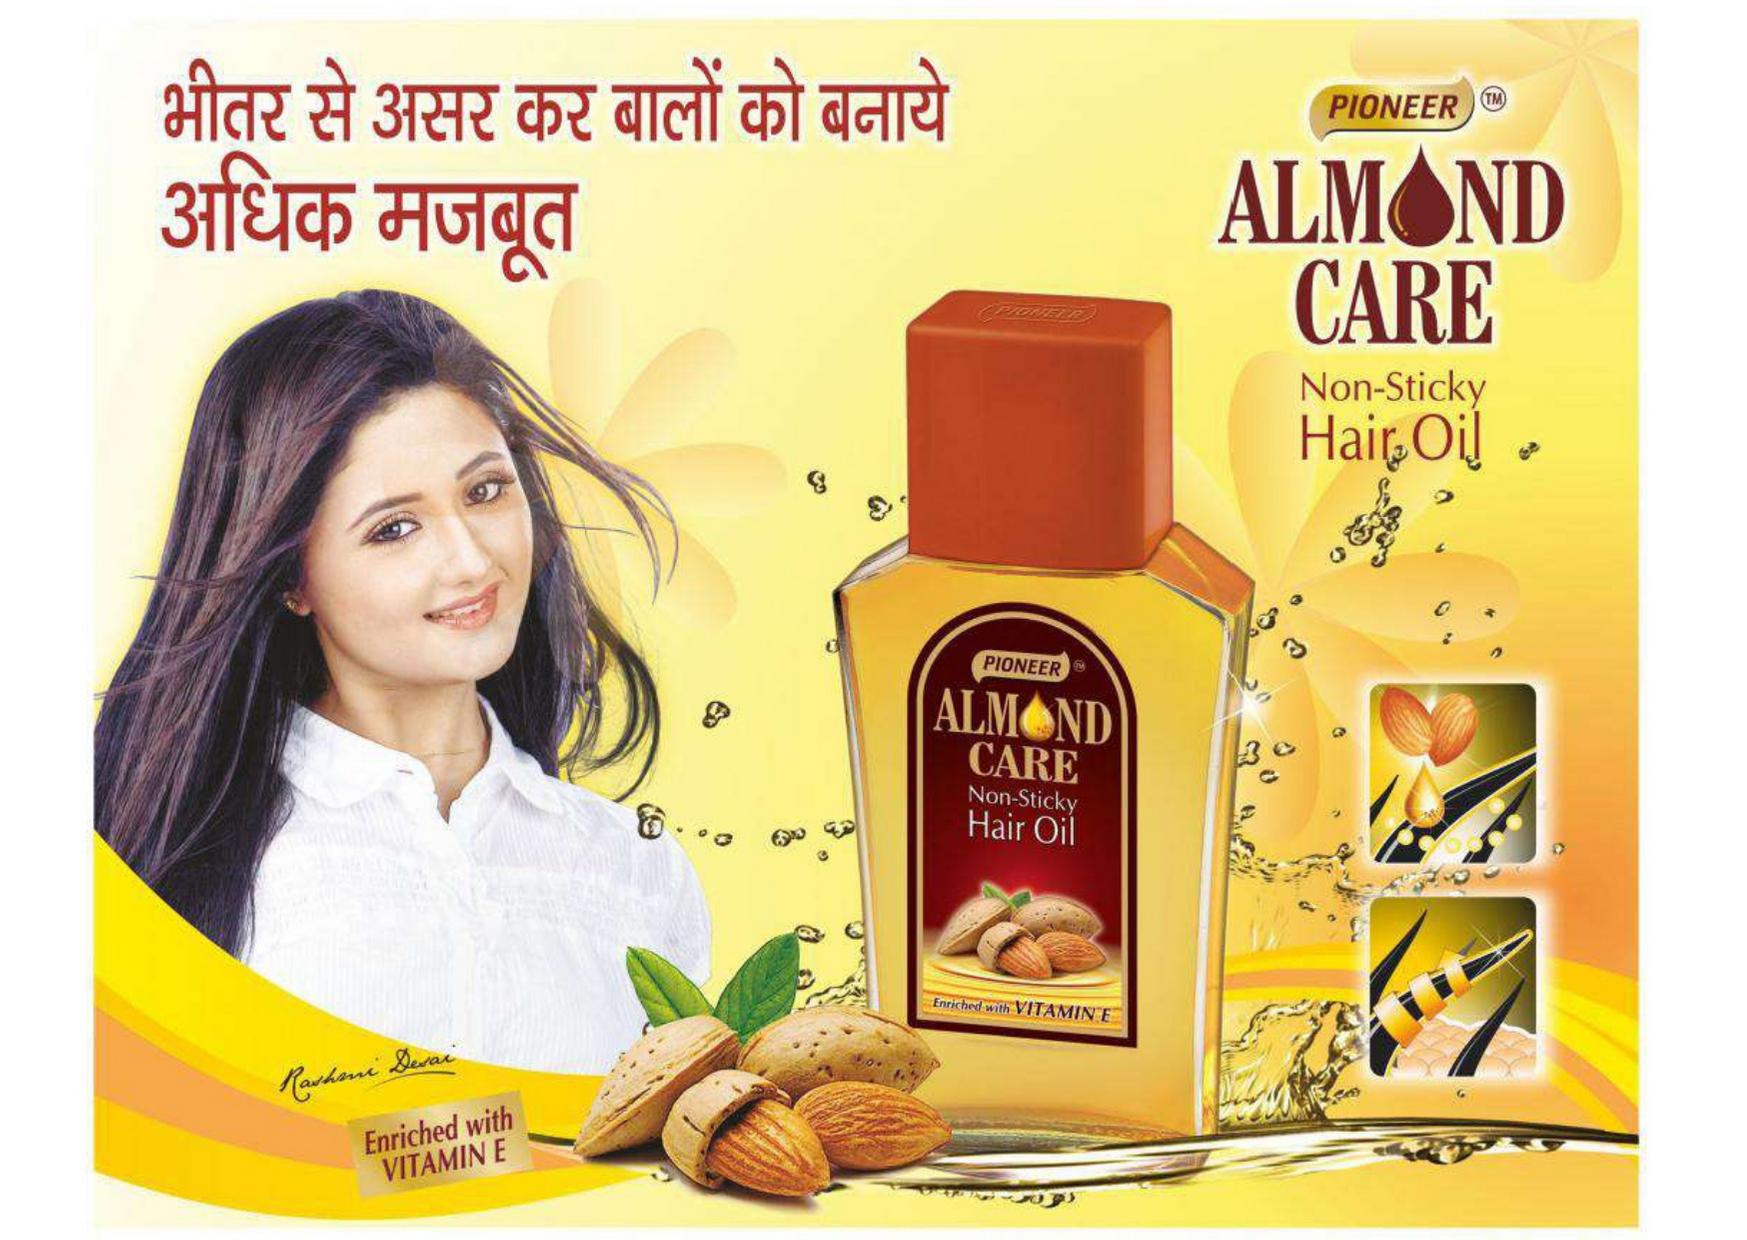 50ml Pioneer Almond Care Hair Oil